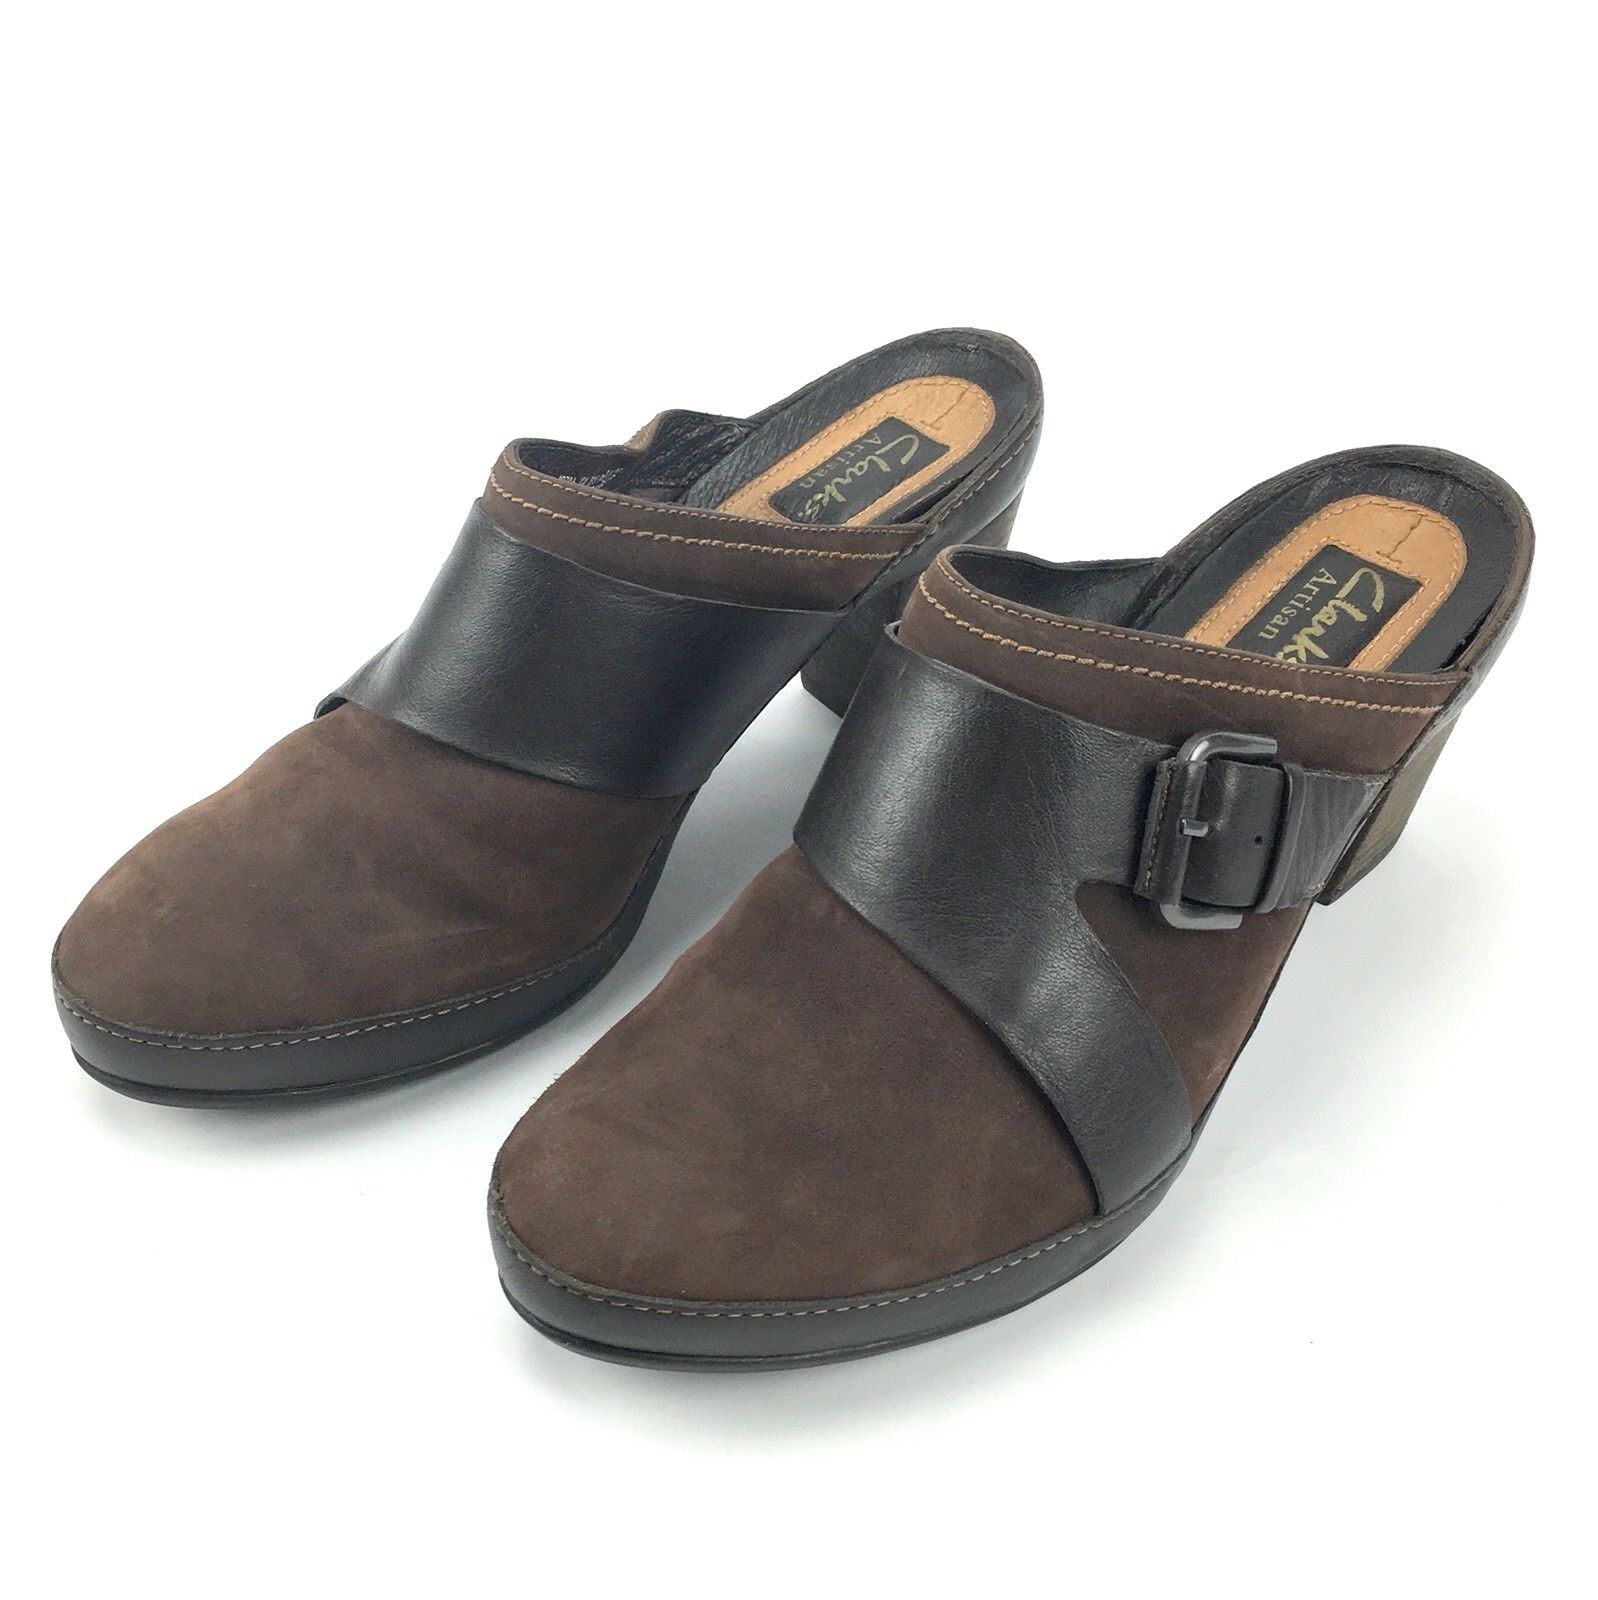 Clarks Artisan Womens Size 9.5M Dark Brown Mules Clogs Heels 82784 shoes